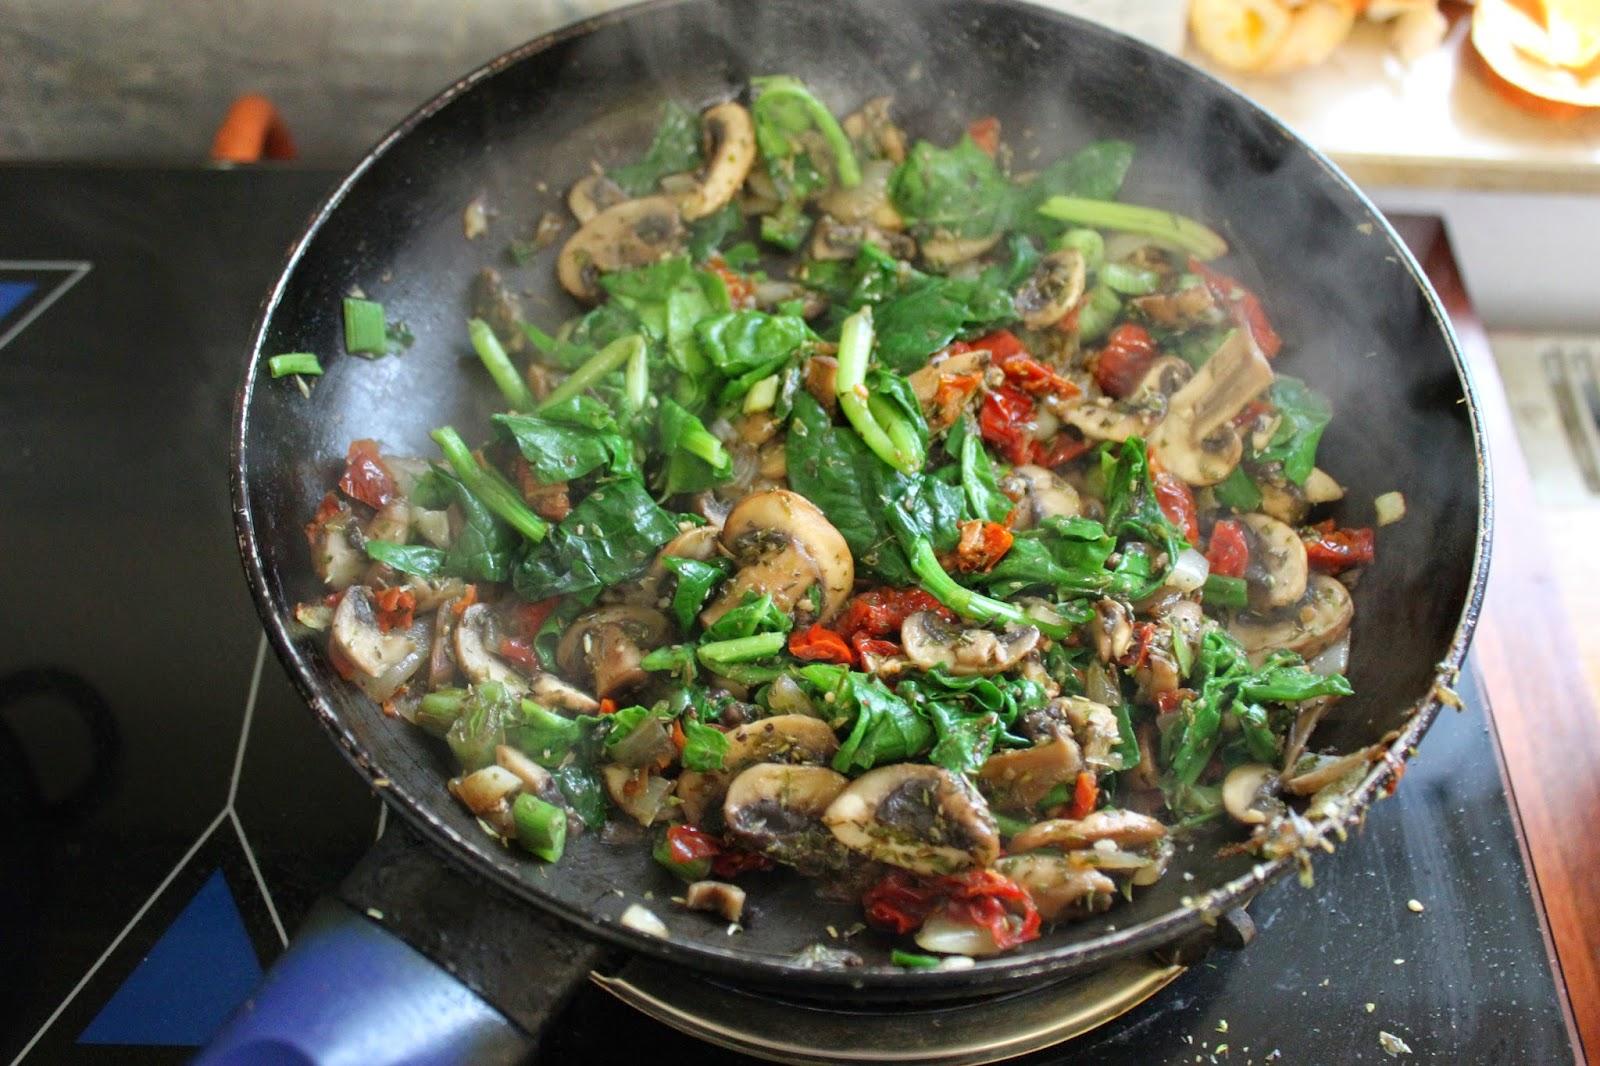 goldtogreen_vegan_spinach_tomatoe_mushroom_quiche_6.JPG